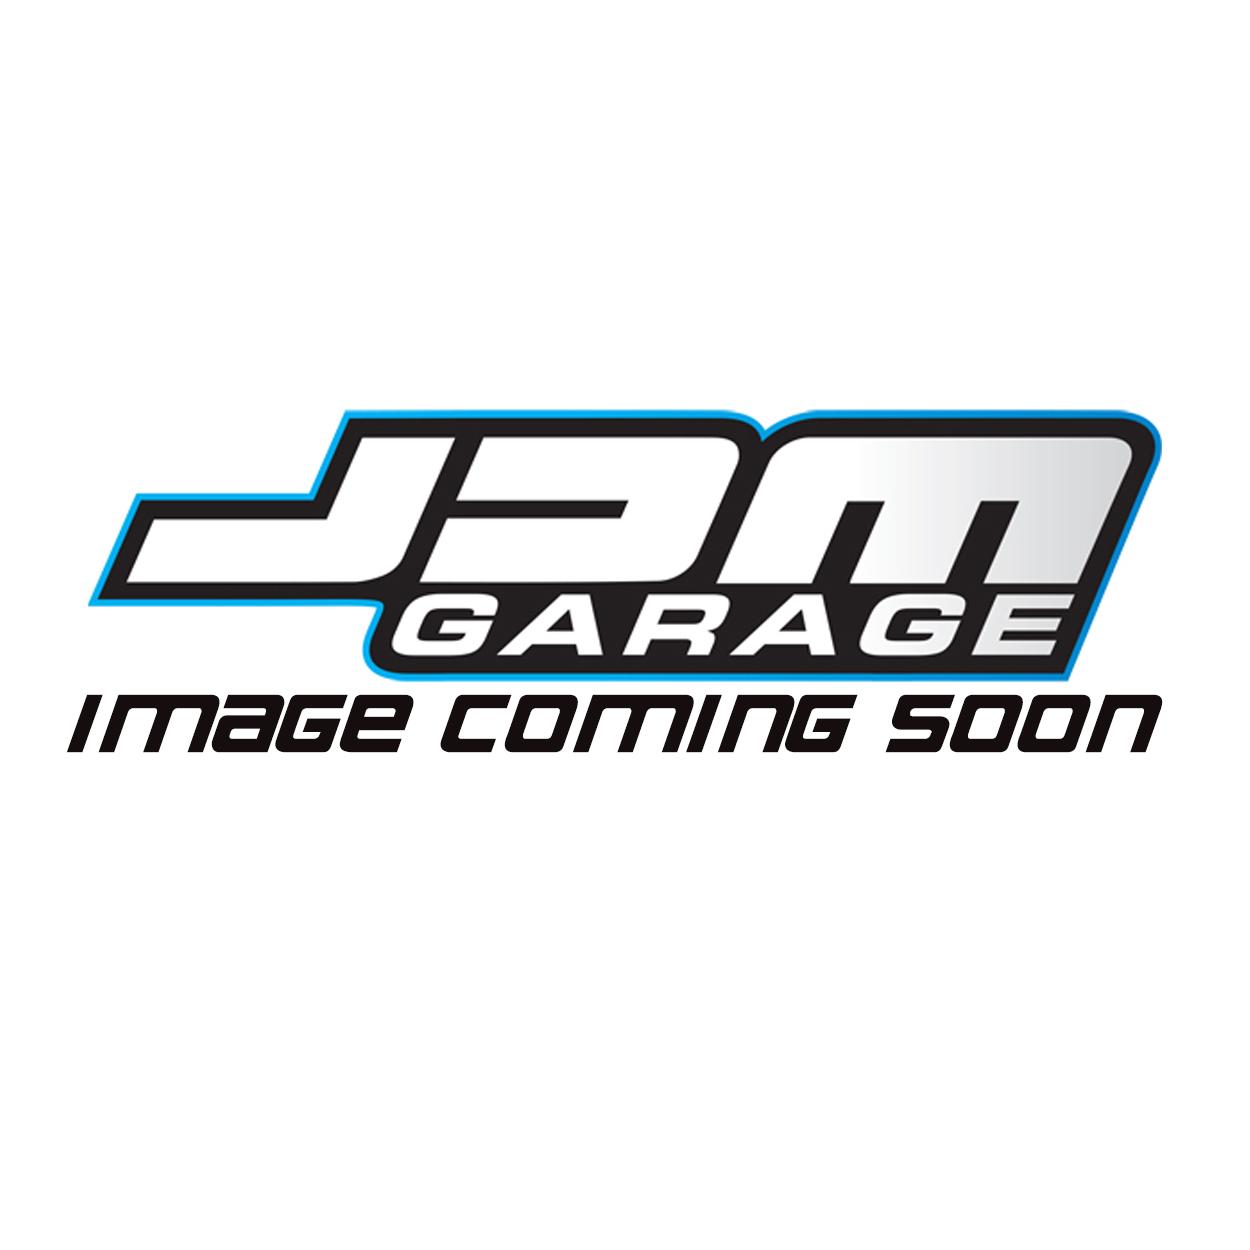 Genuine Nismo Heritage Windscreen Moulding Clip For Nissan Skyline R32 GTR 72796-RHR20